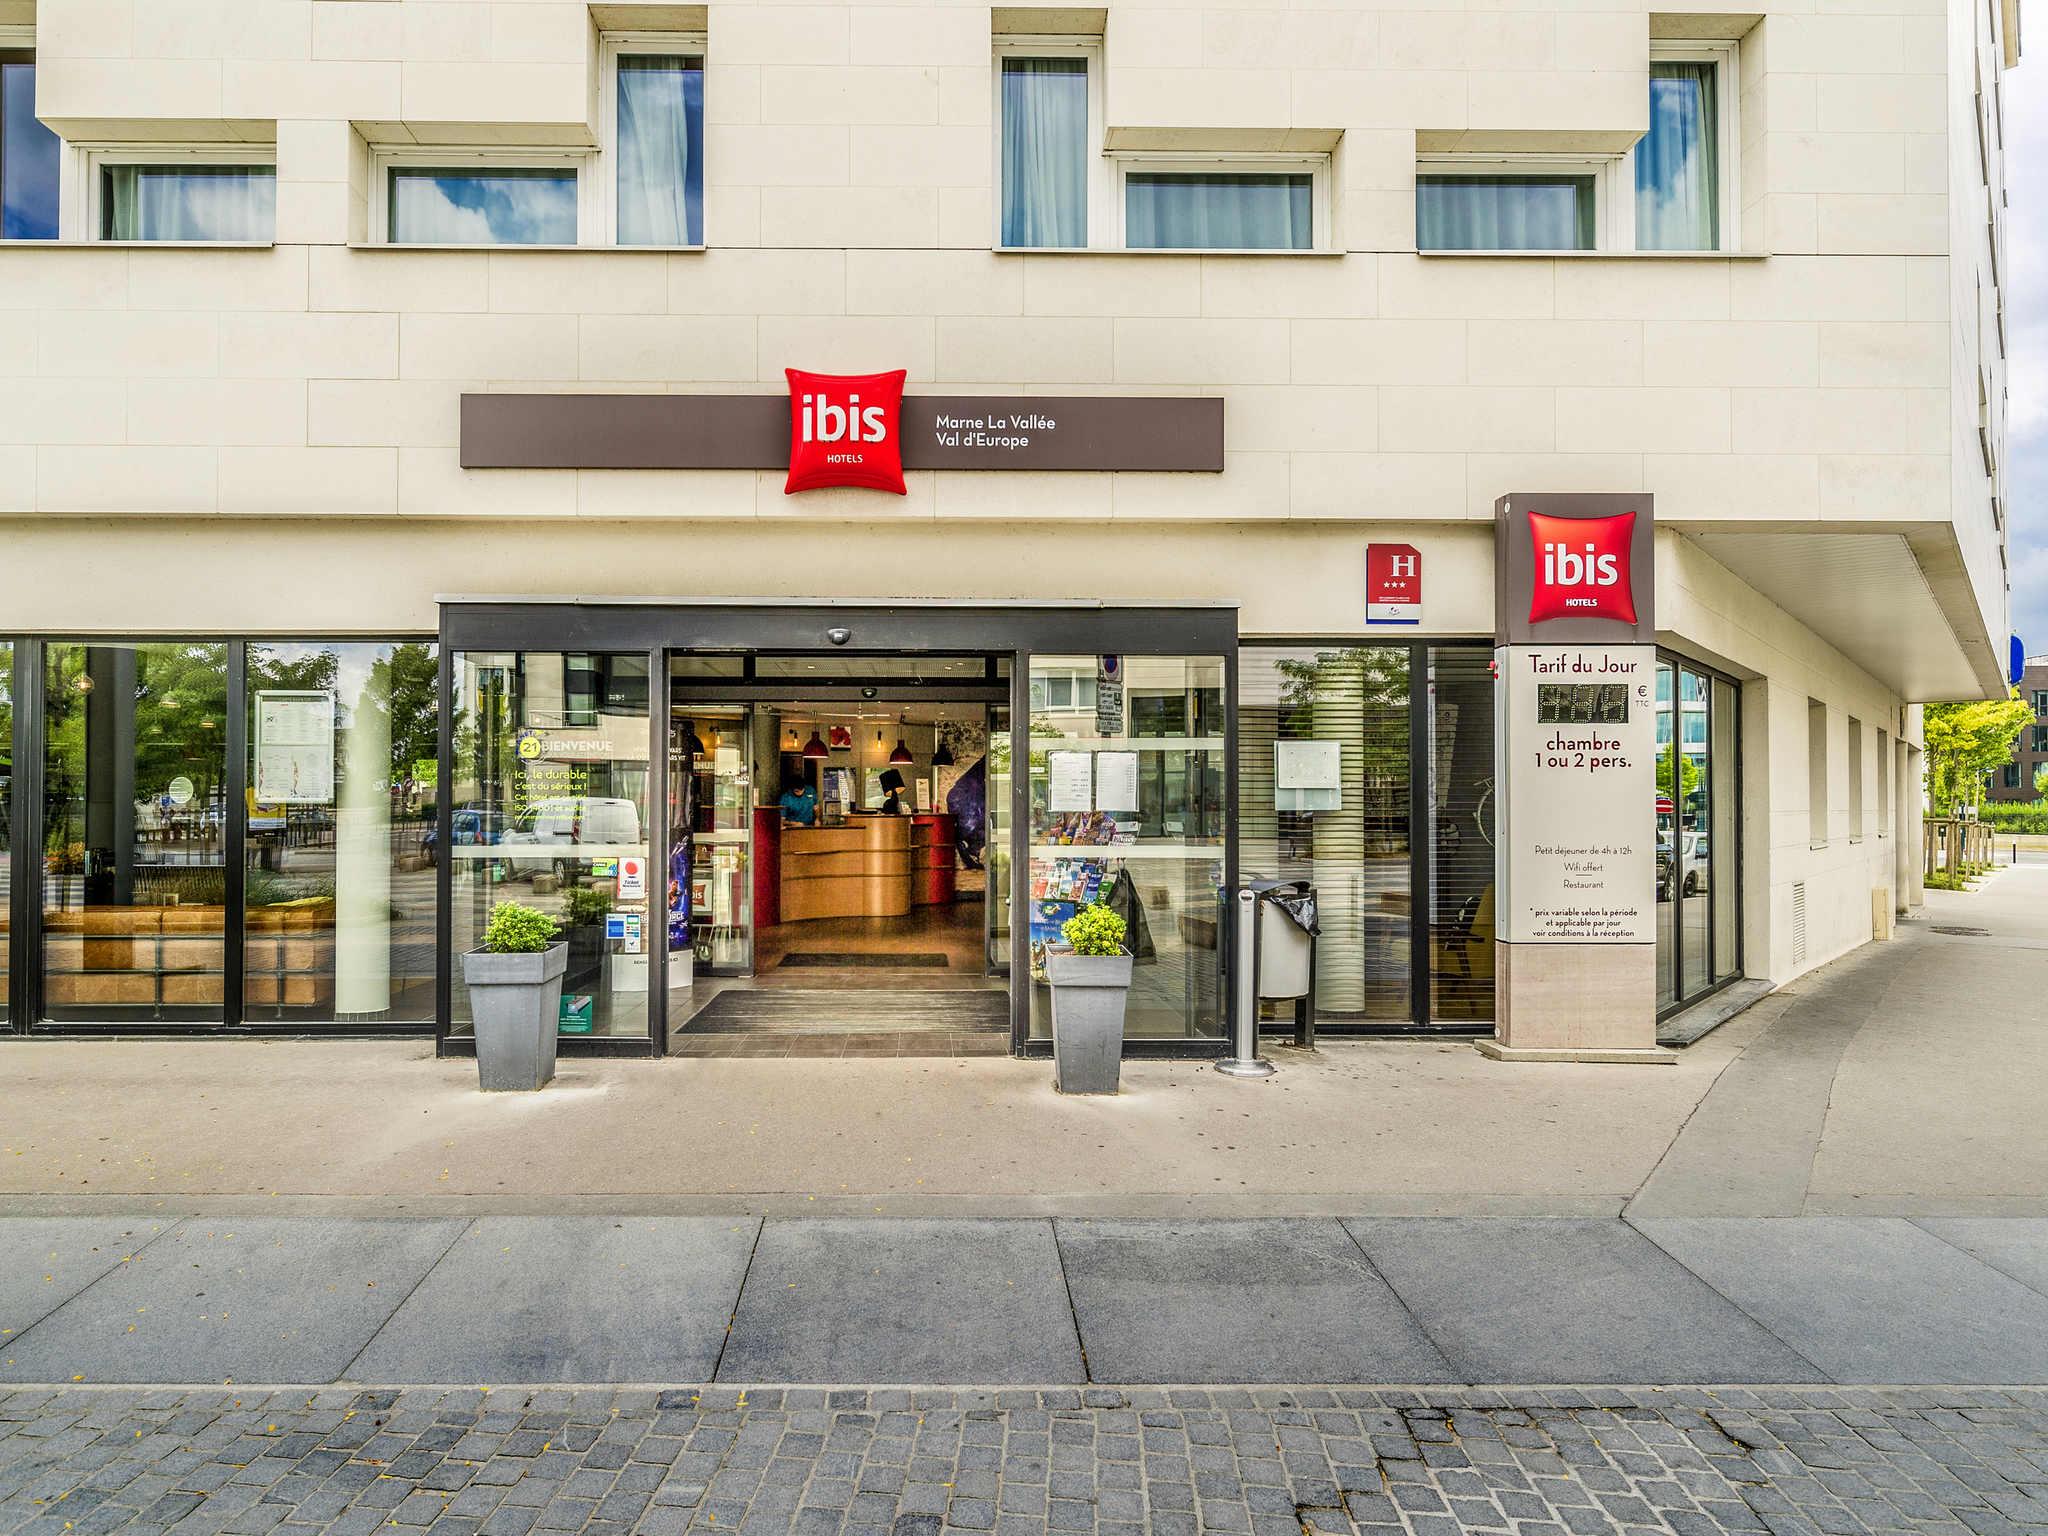 Hotel - ibis Marne la Vallée Val d'Europe